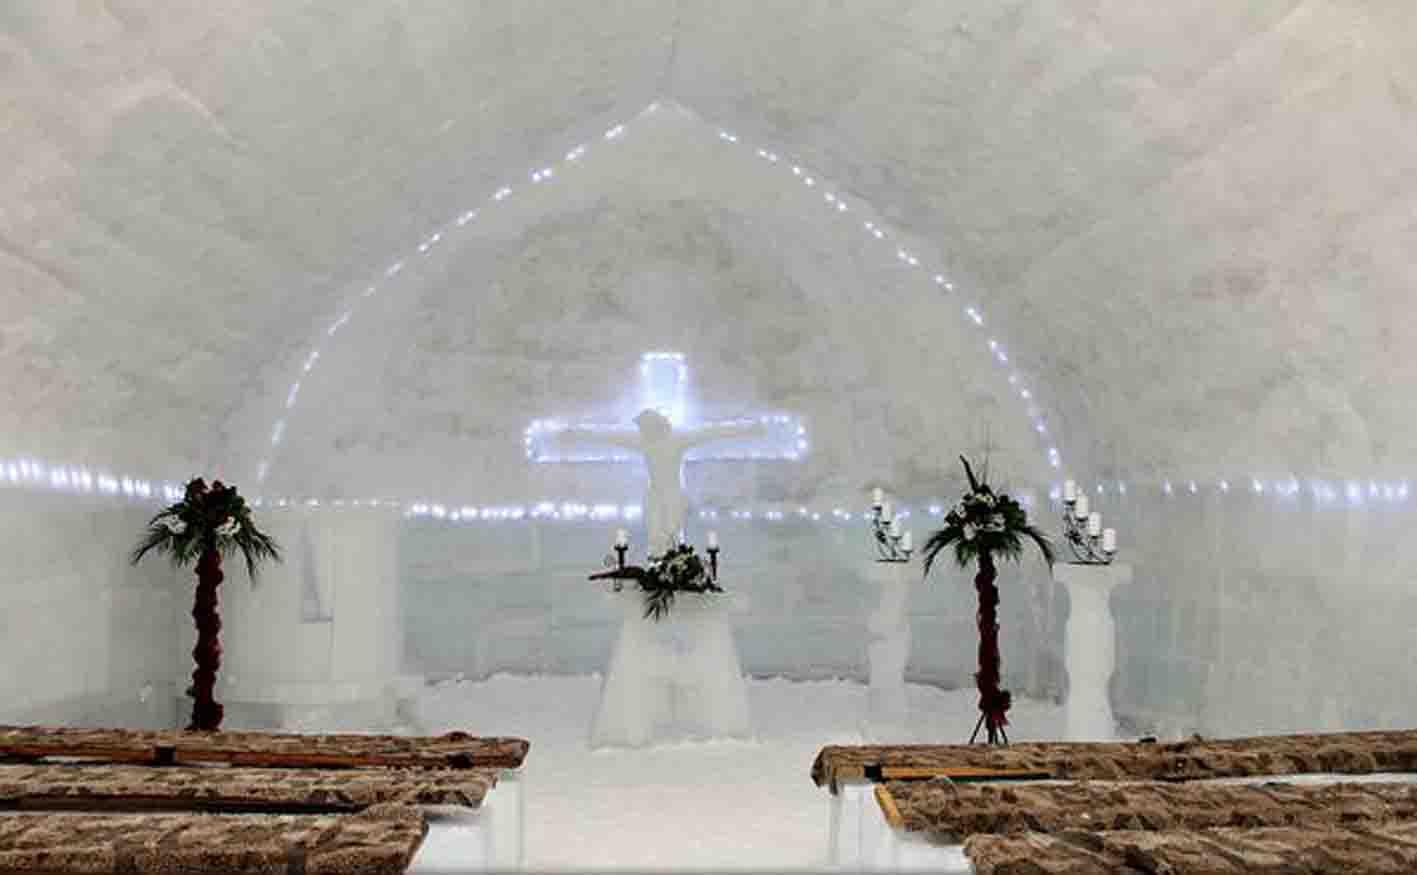 biserica de gheata